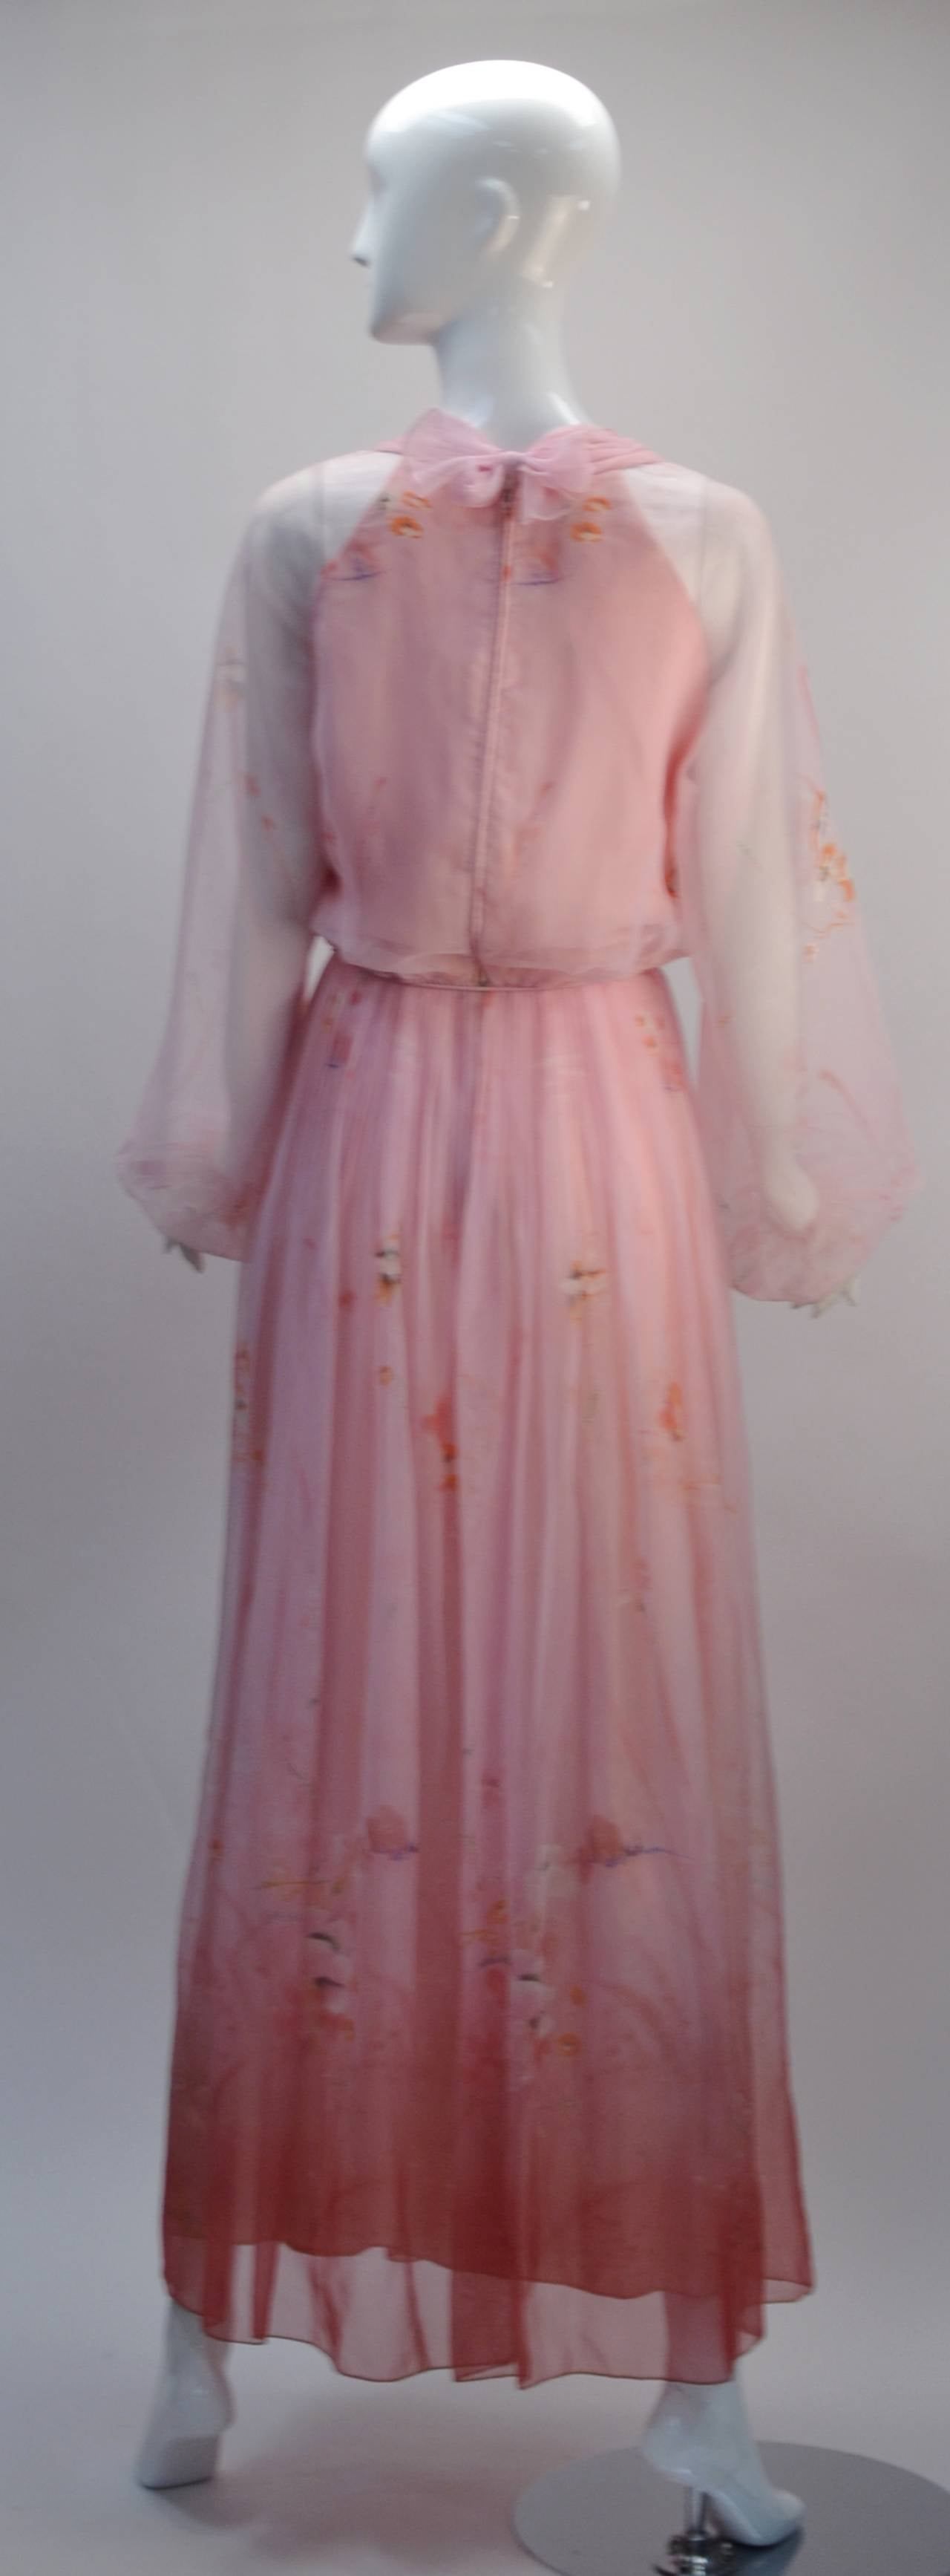 1970s Lillie Rubin Pink Sheer Dress 2